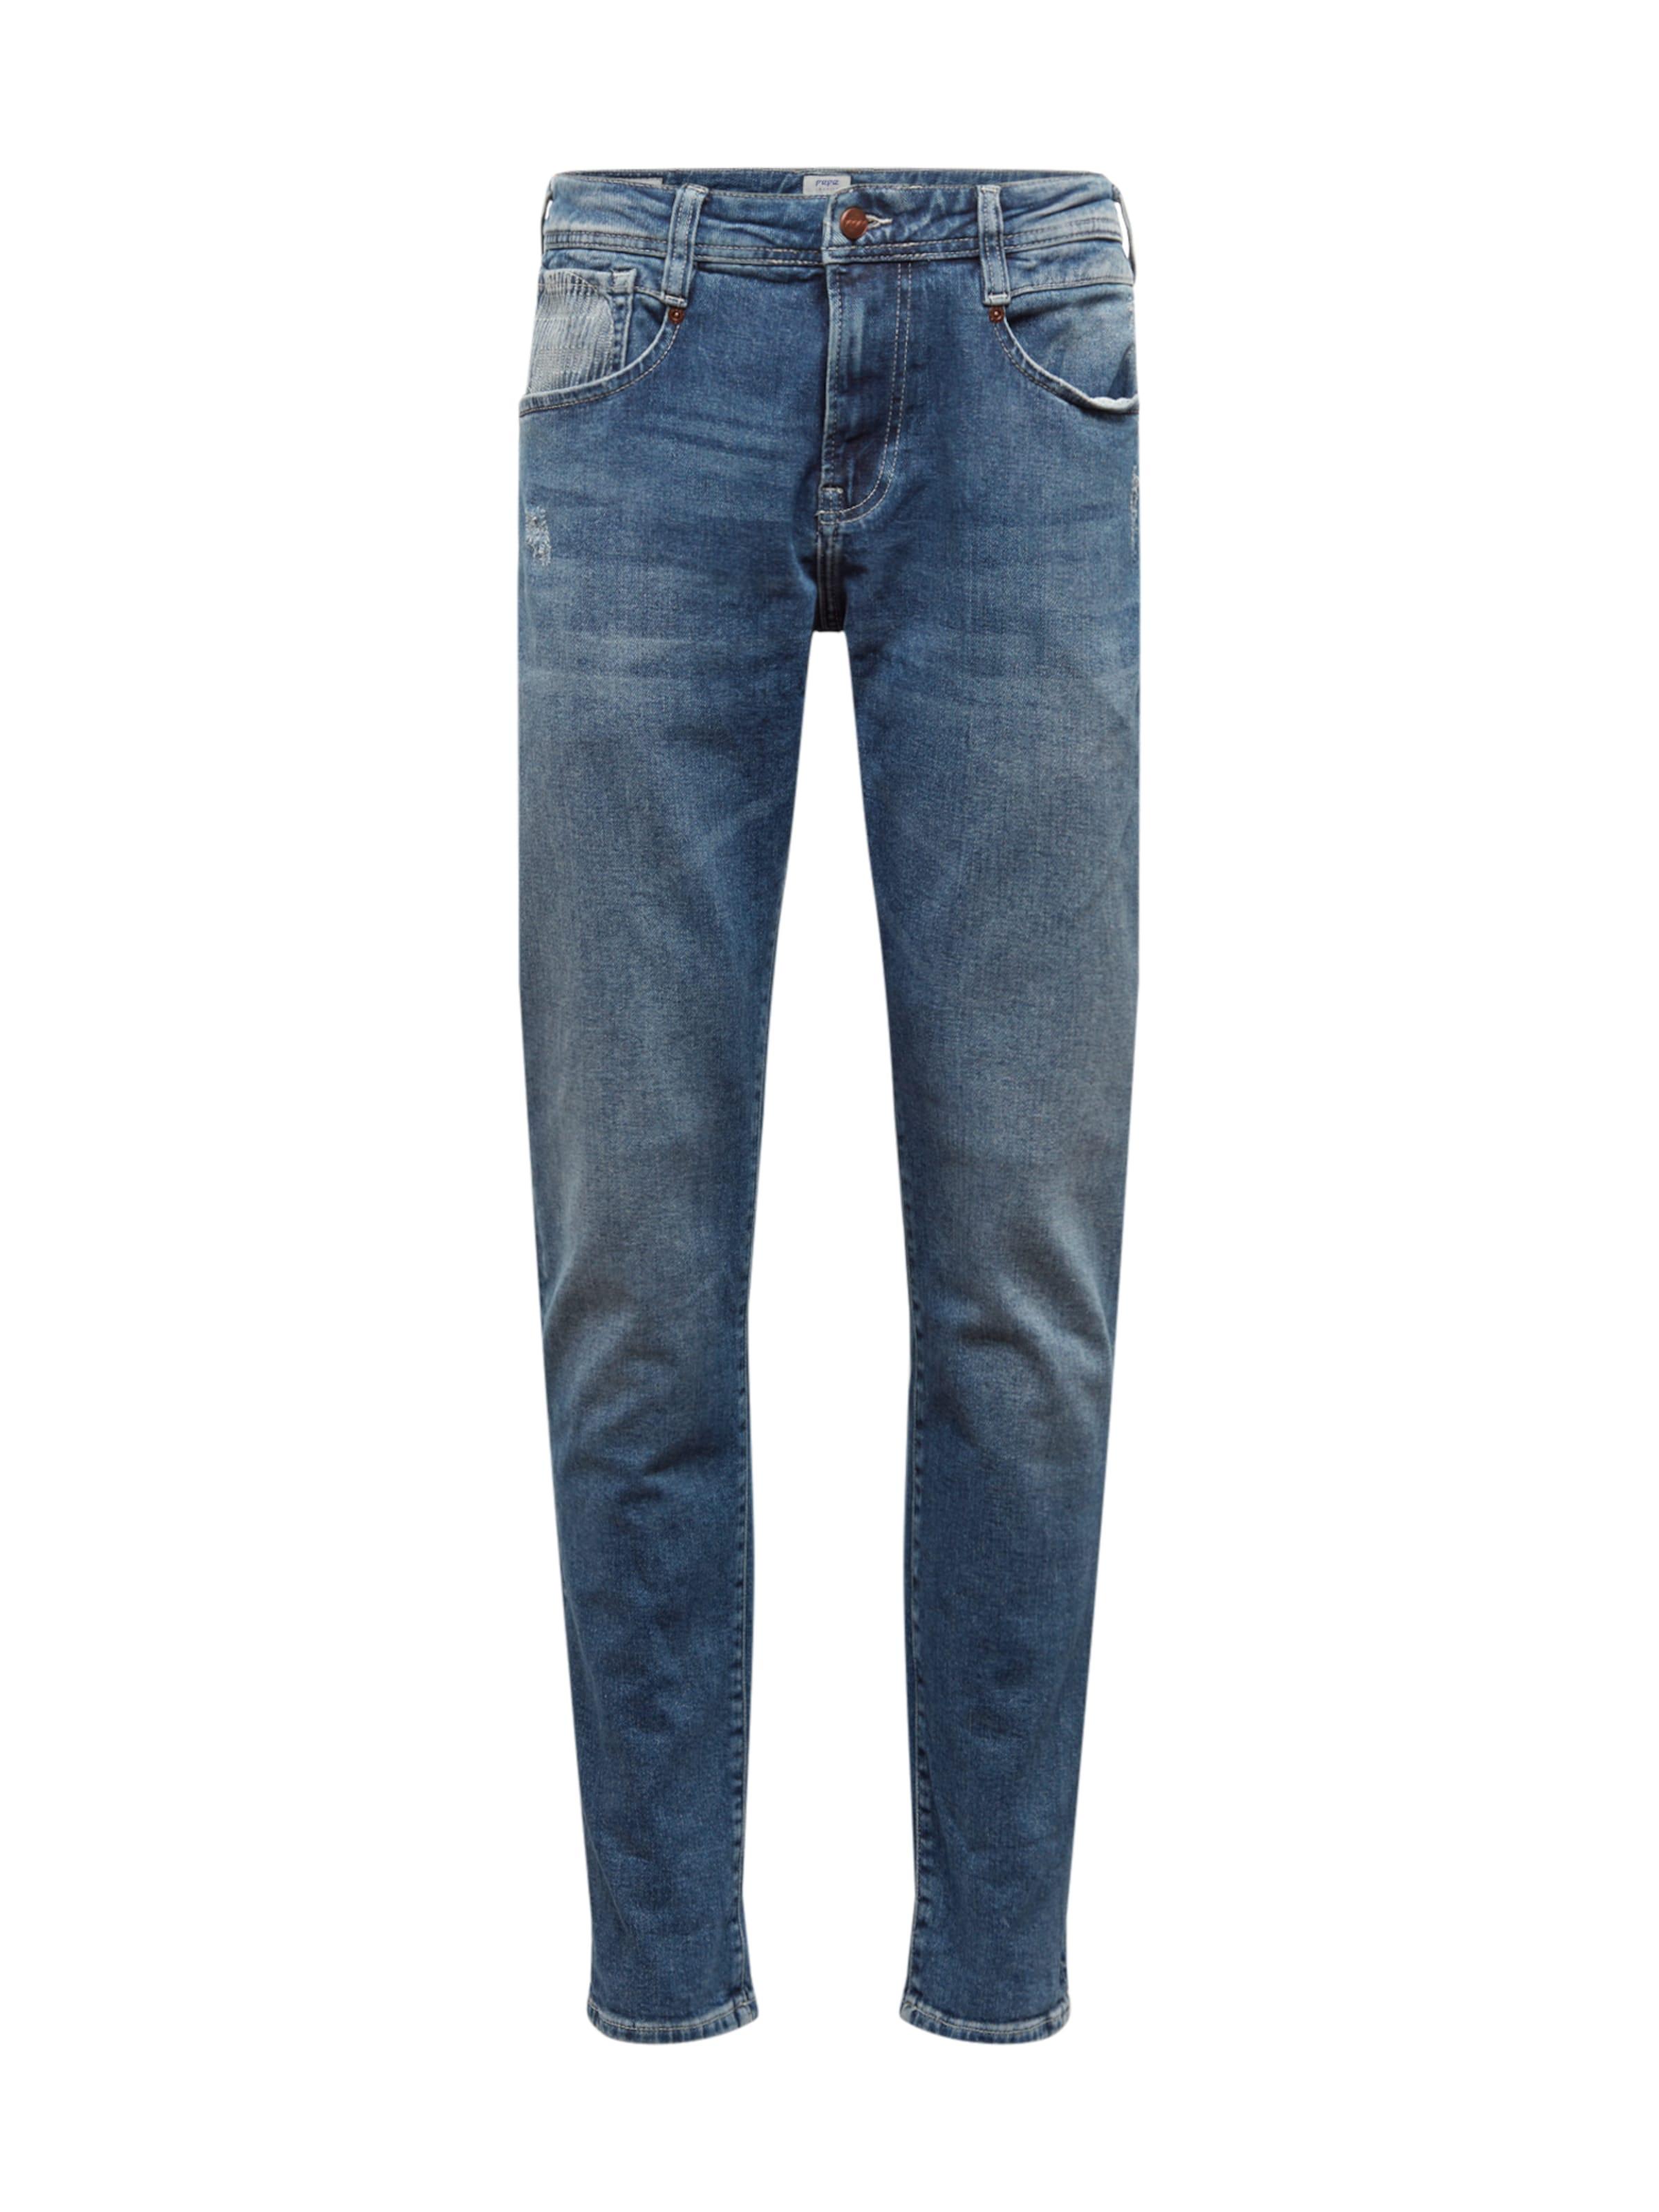 Pepe Jeans Archive' Bleu Jean 'camden En Denim shQrdCt